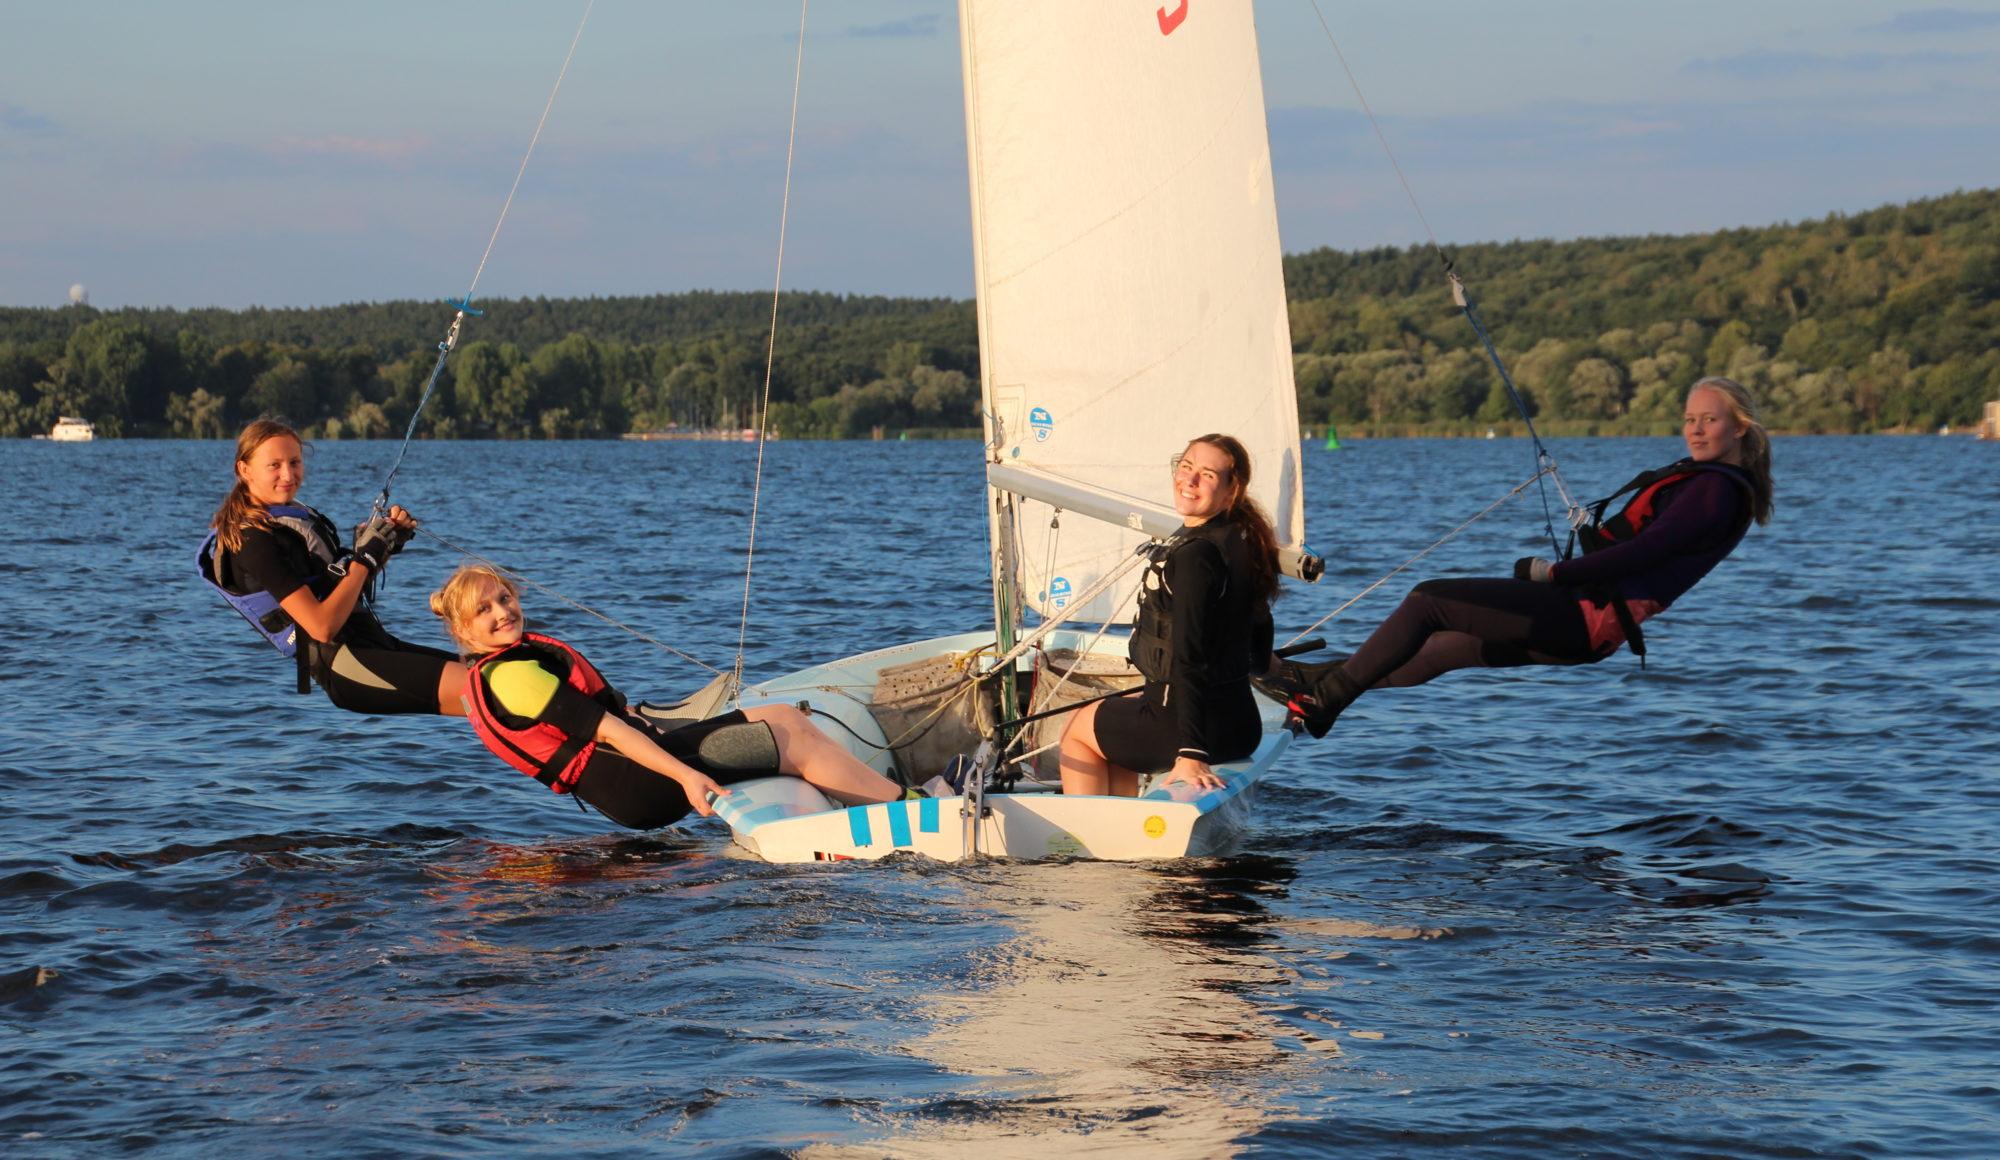 Blog des Yacht-Club Müggelsee e.V.